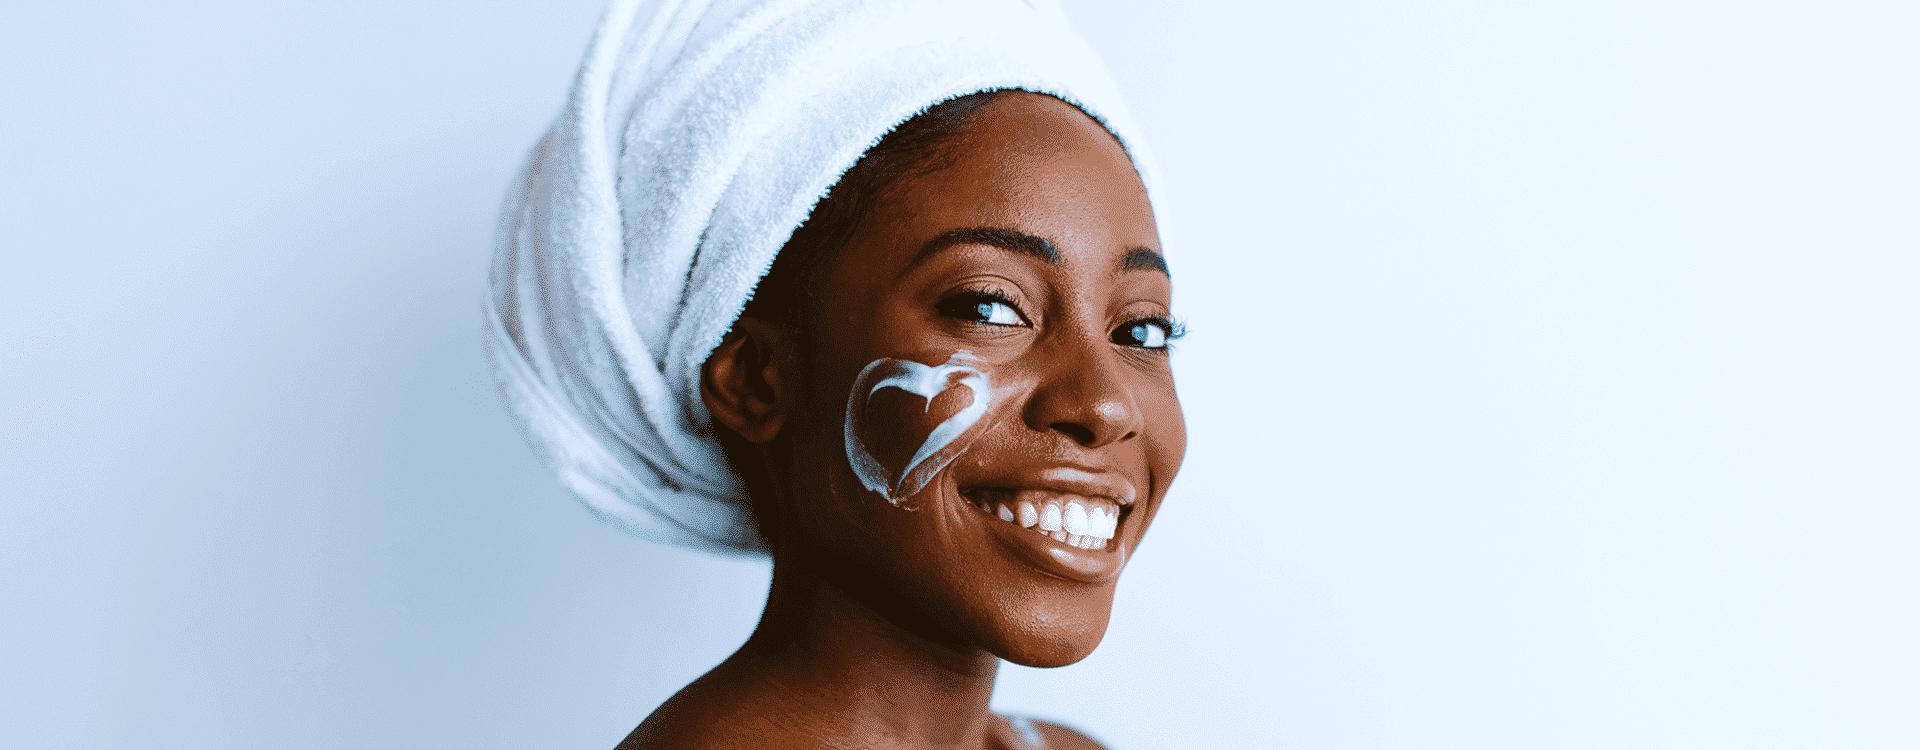 Manchas de sol- dicas de como clarear e tratar manchas da pele